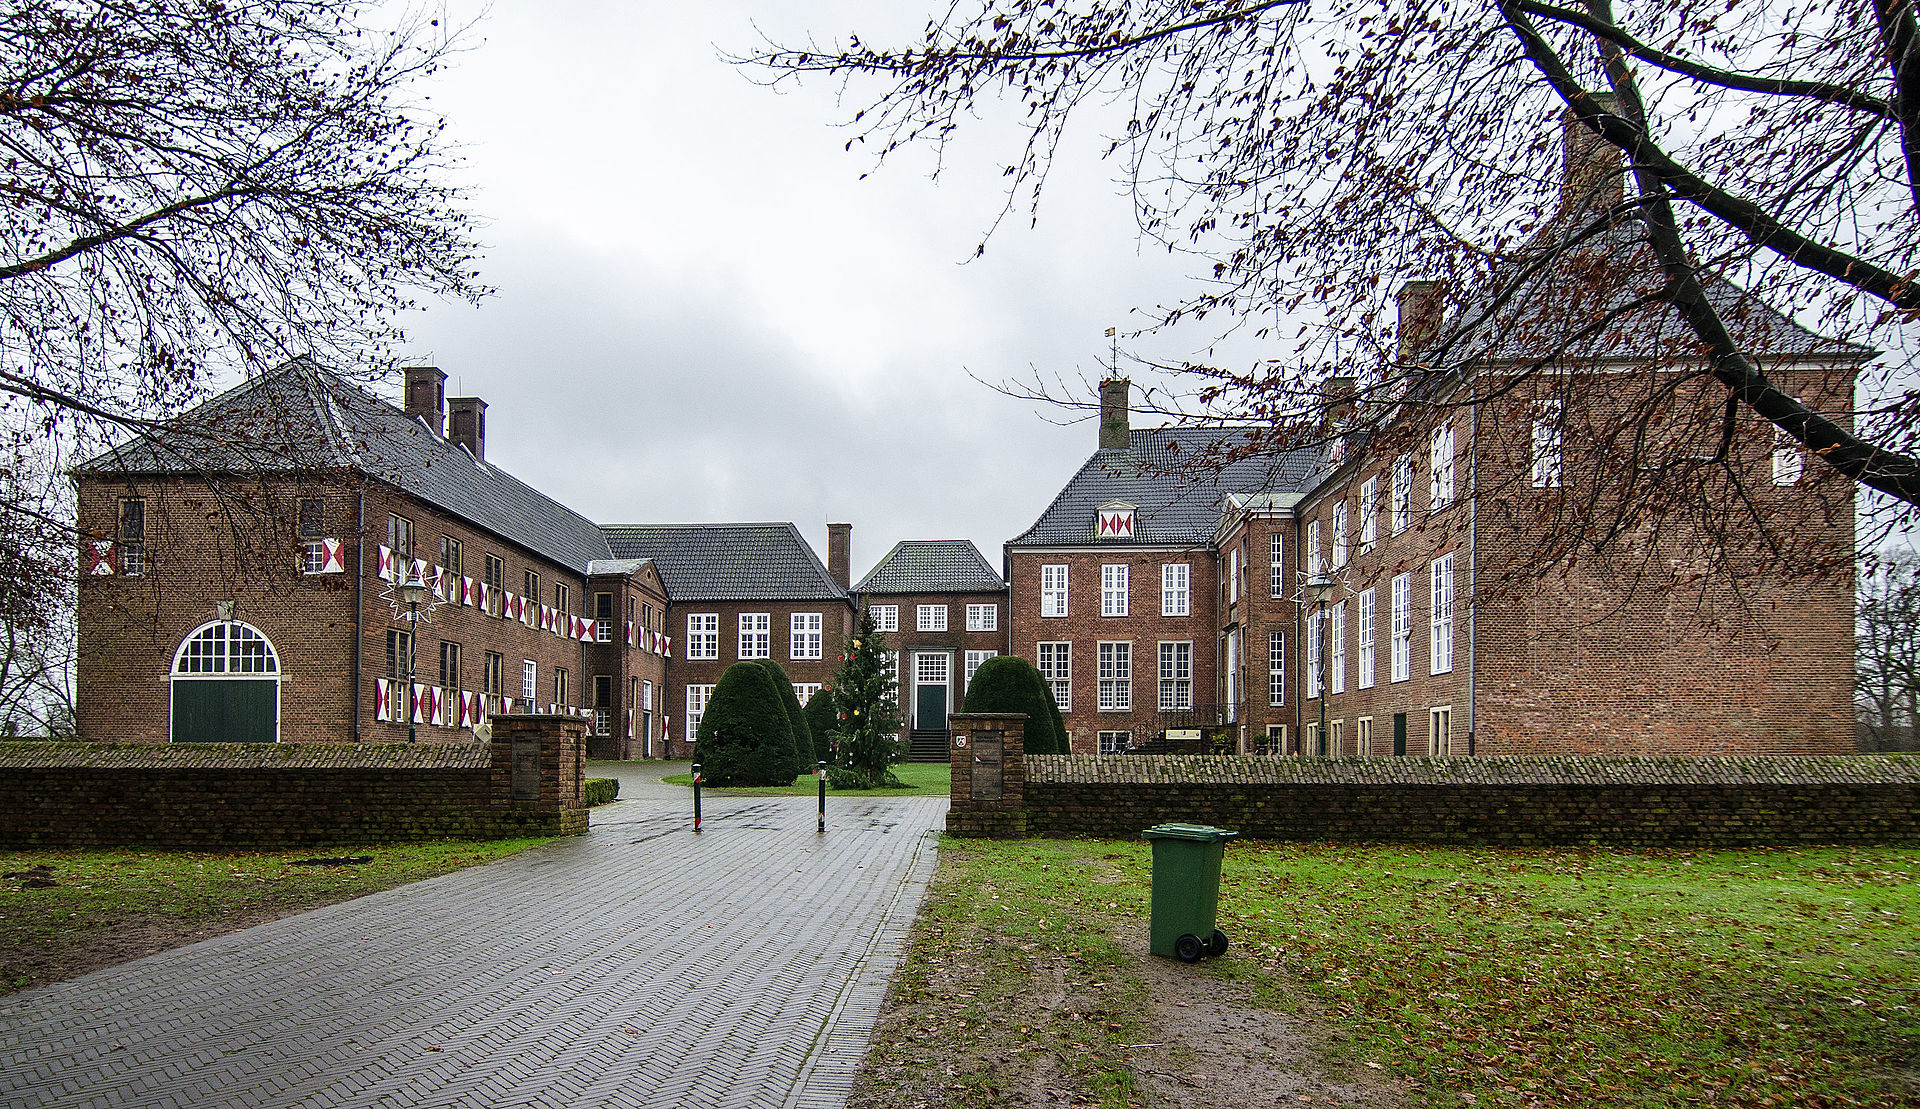 Bild Schloss Ringenberg Hamminkeln